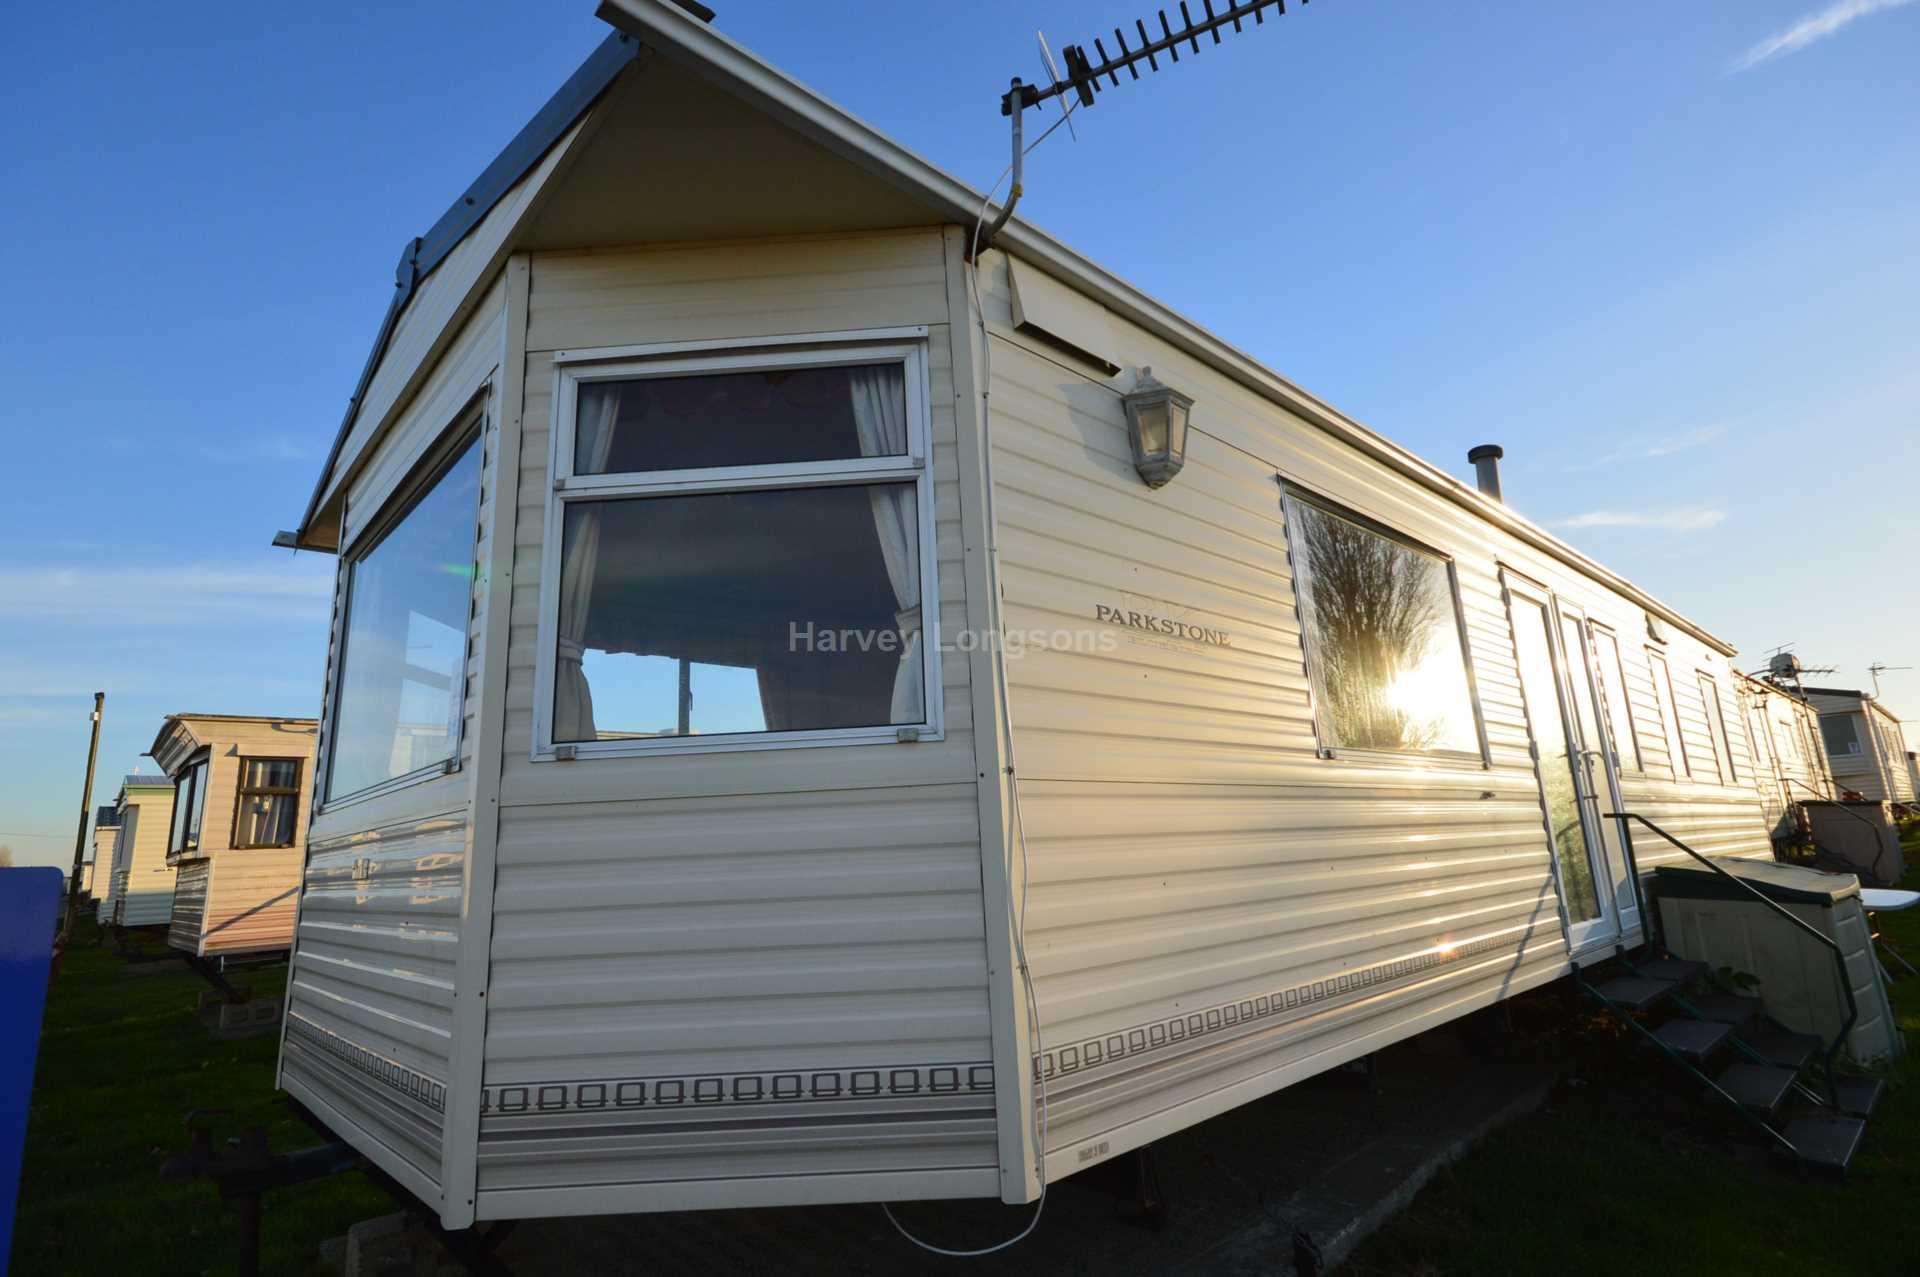 Model UK Private Static Caravan Holiday Hire At Priory Hill LeysdownonSea